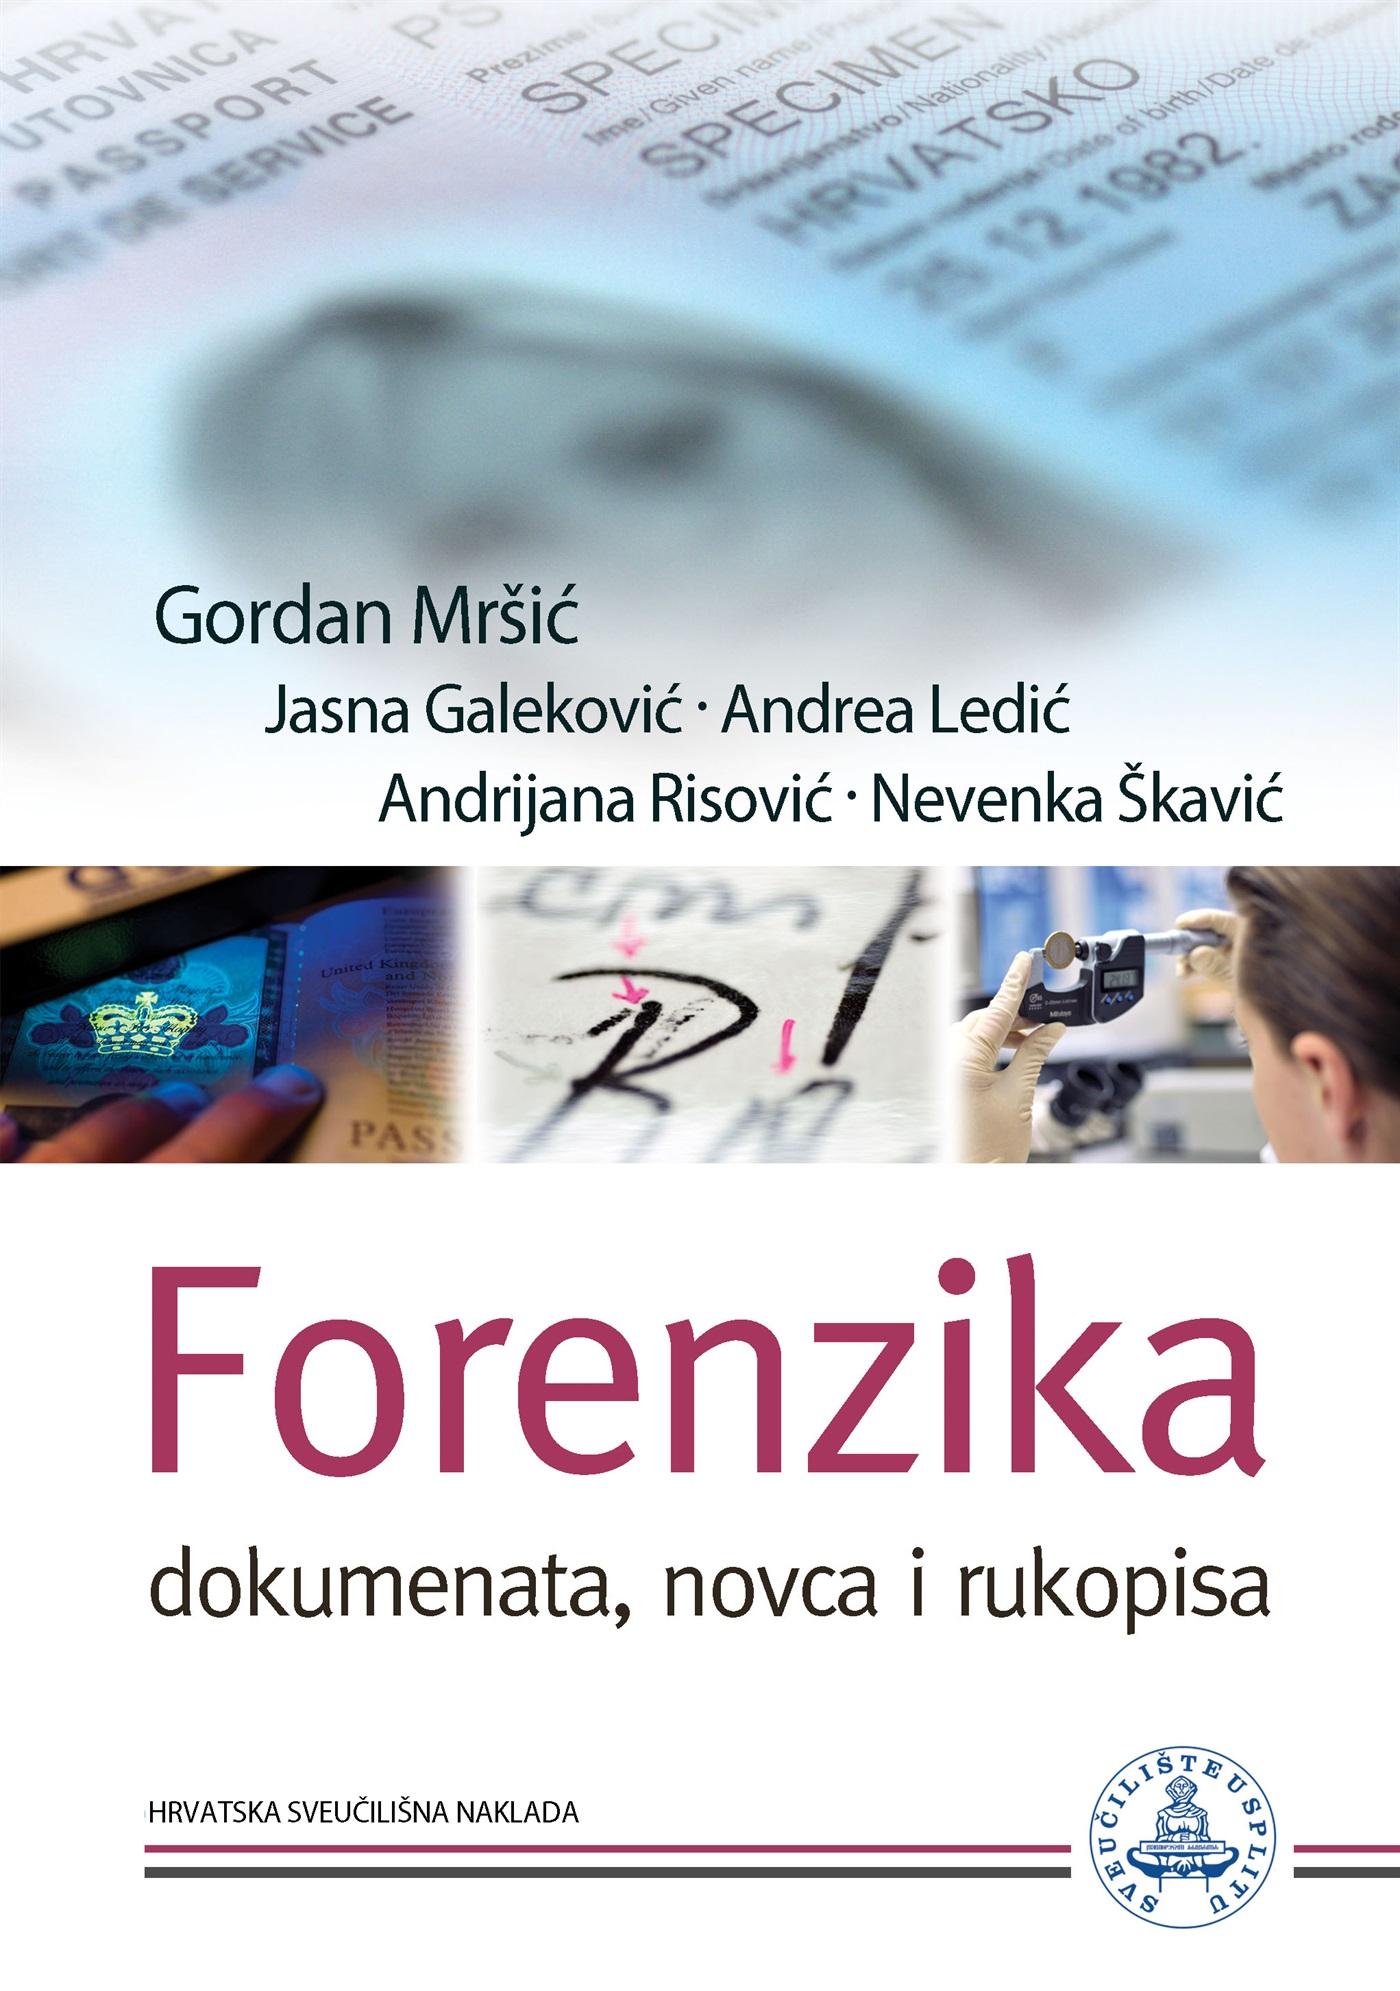 FORENZIKA - Dokumenata, novca i rukopisa